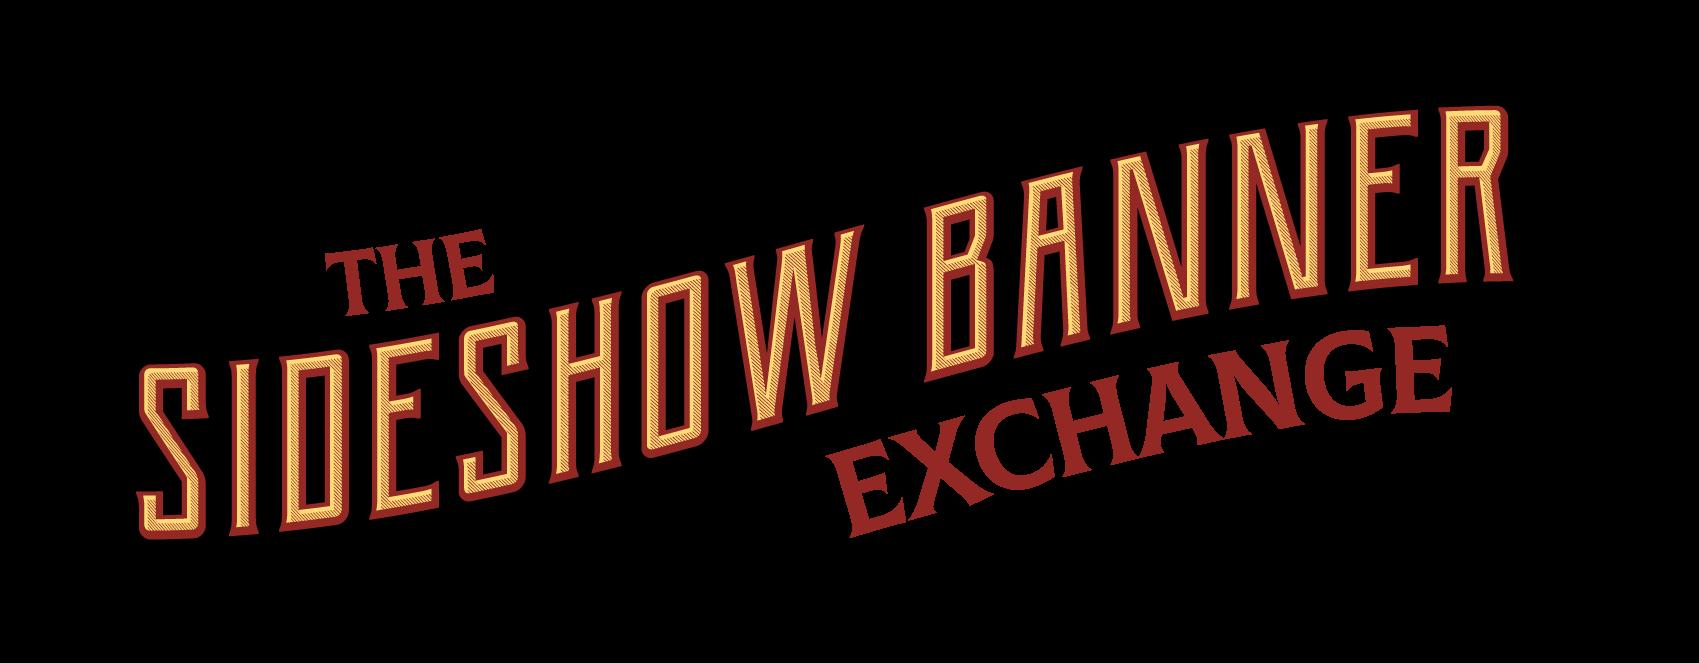 Sideshow Banner Exchange